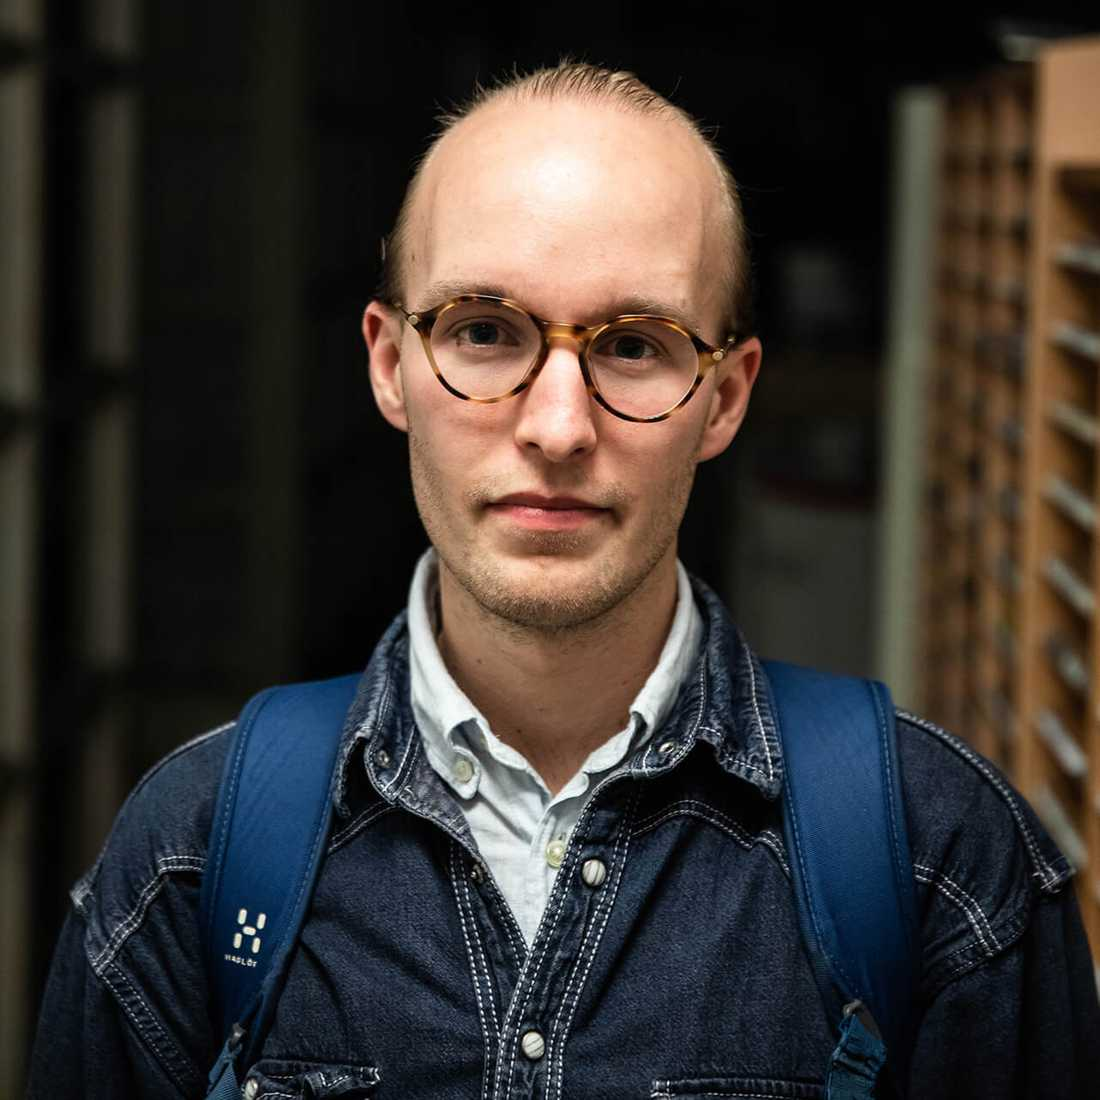 Ludwig Bengtsson Sonesson, klimatforskare vid Lunds universitet, representerar Sveriges unga på FN:s klimattoppmöten.